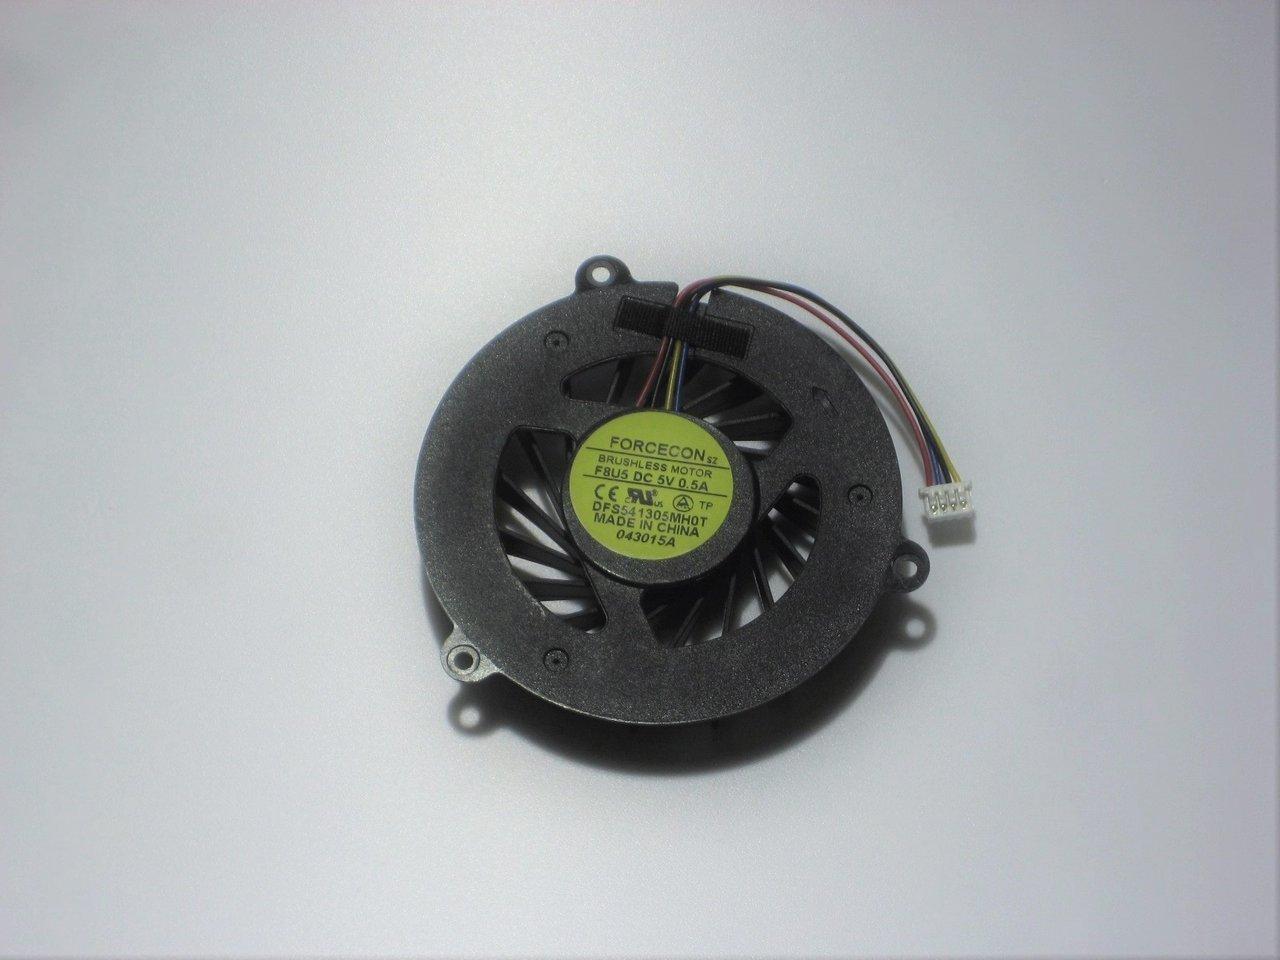 Forcecon DFS541305MH0T Kühler Lüfter für ASUS Notebook